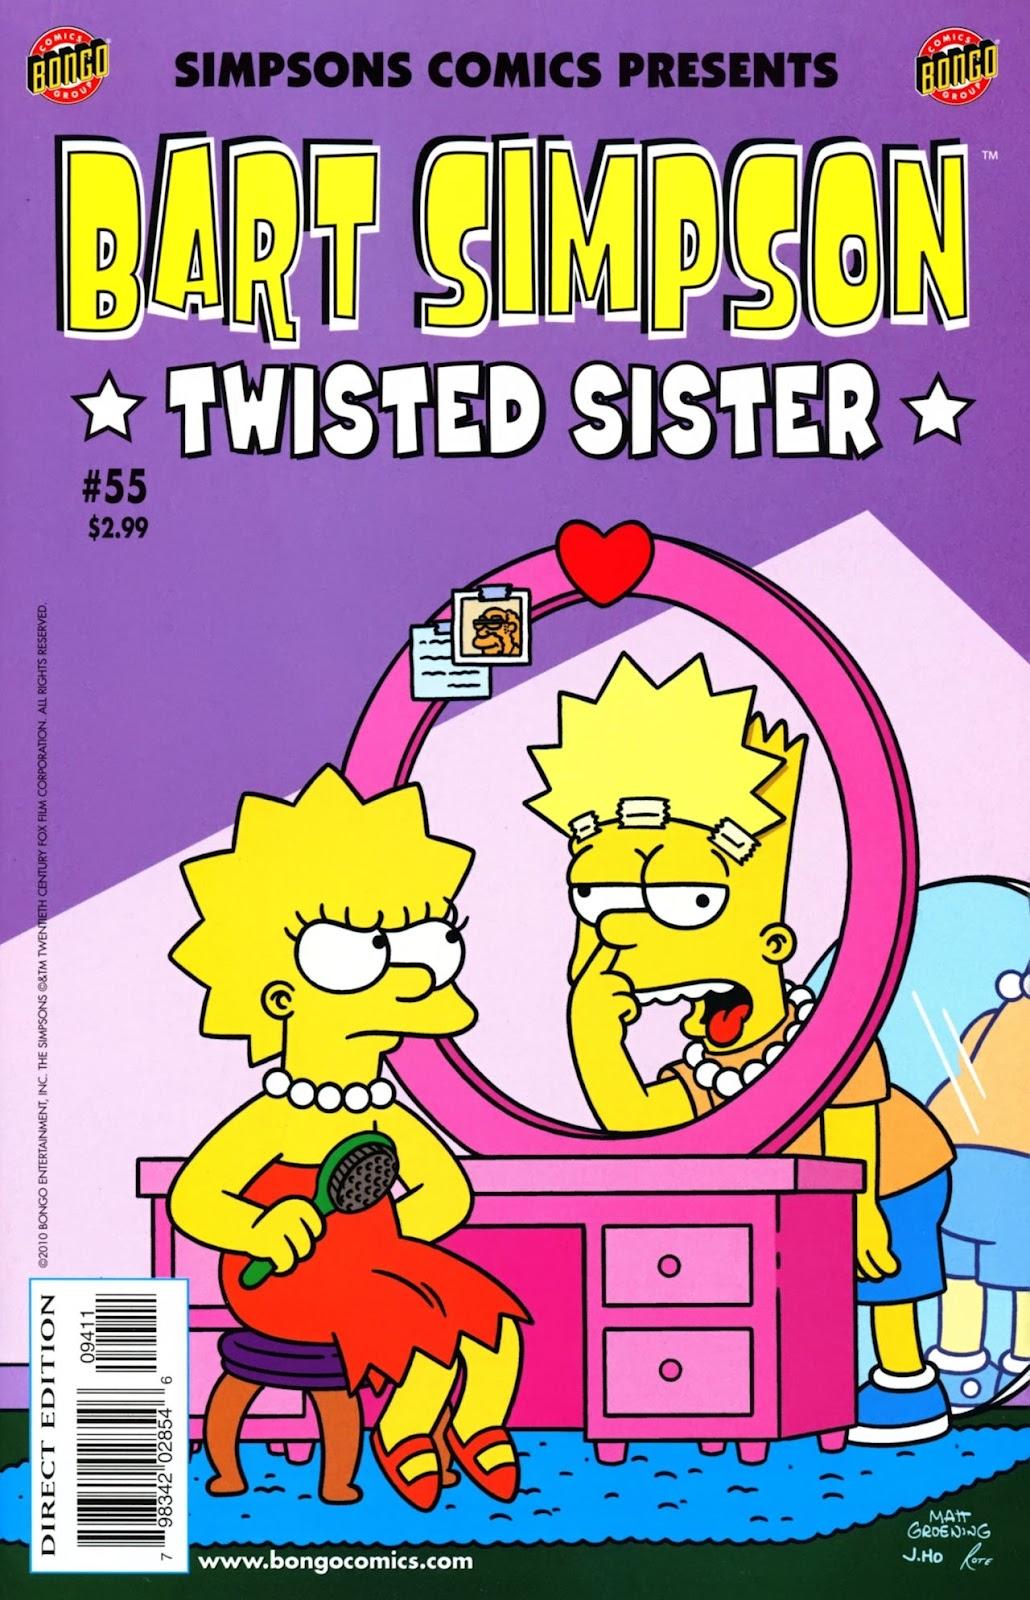 Simpsons Comics Presents Bart Simpson 55 Page 1